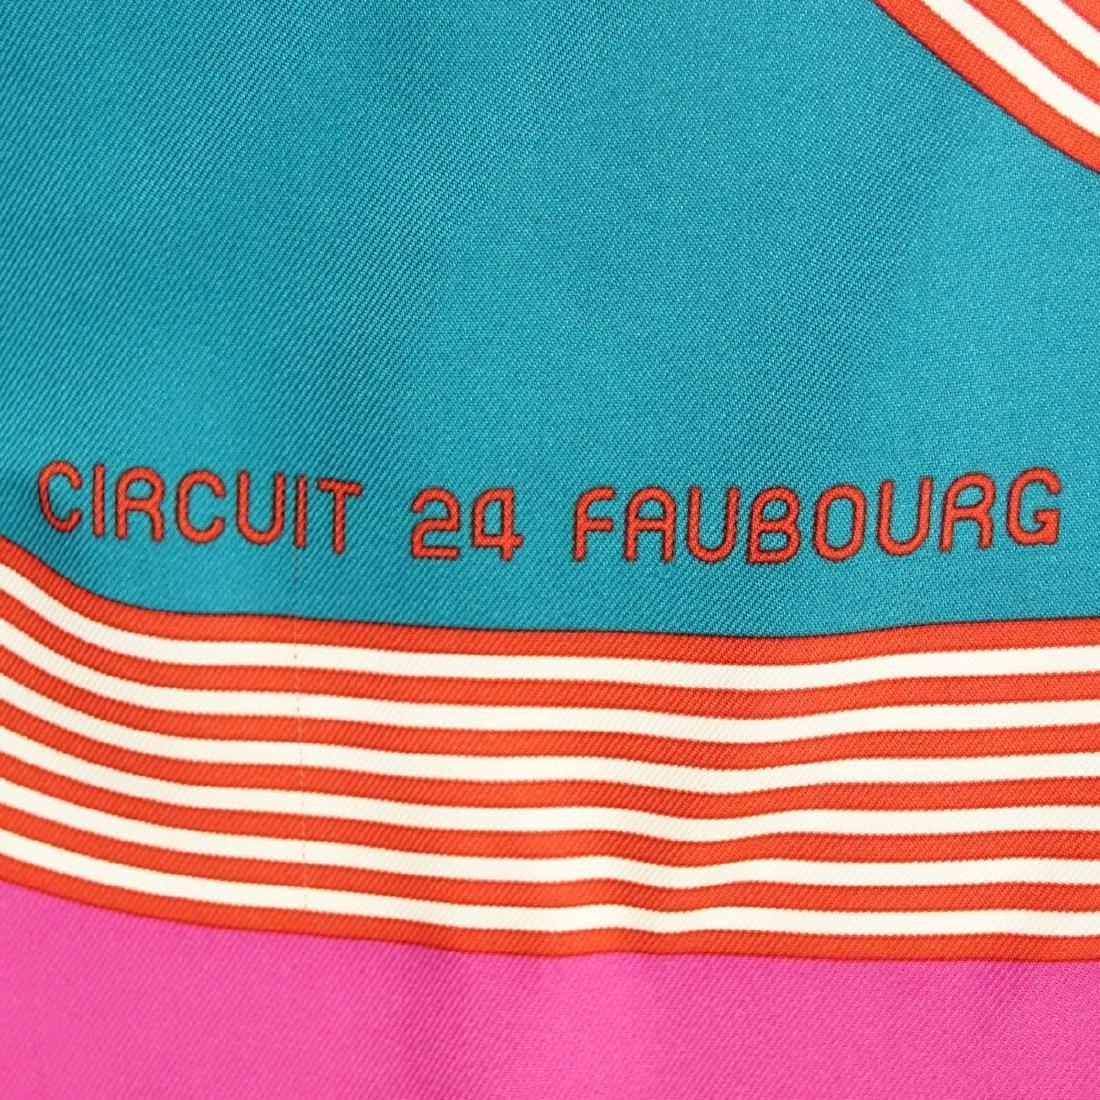 Hermes Circuit 24 Faubourg Twill Silk Scarf - 4